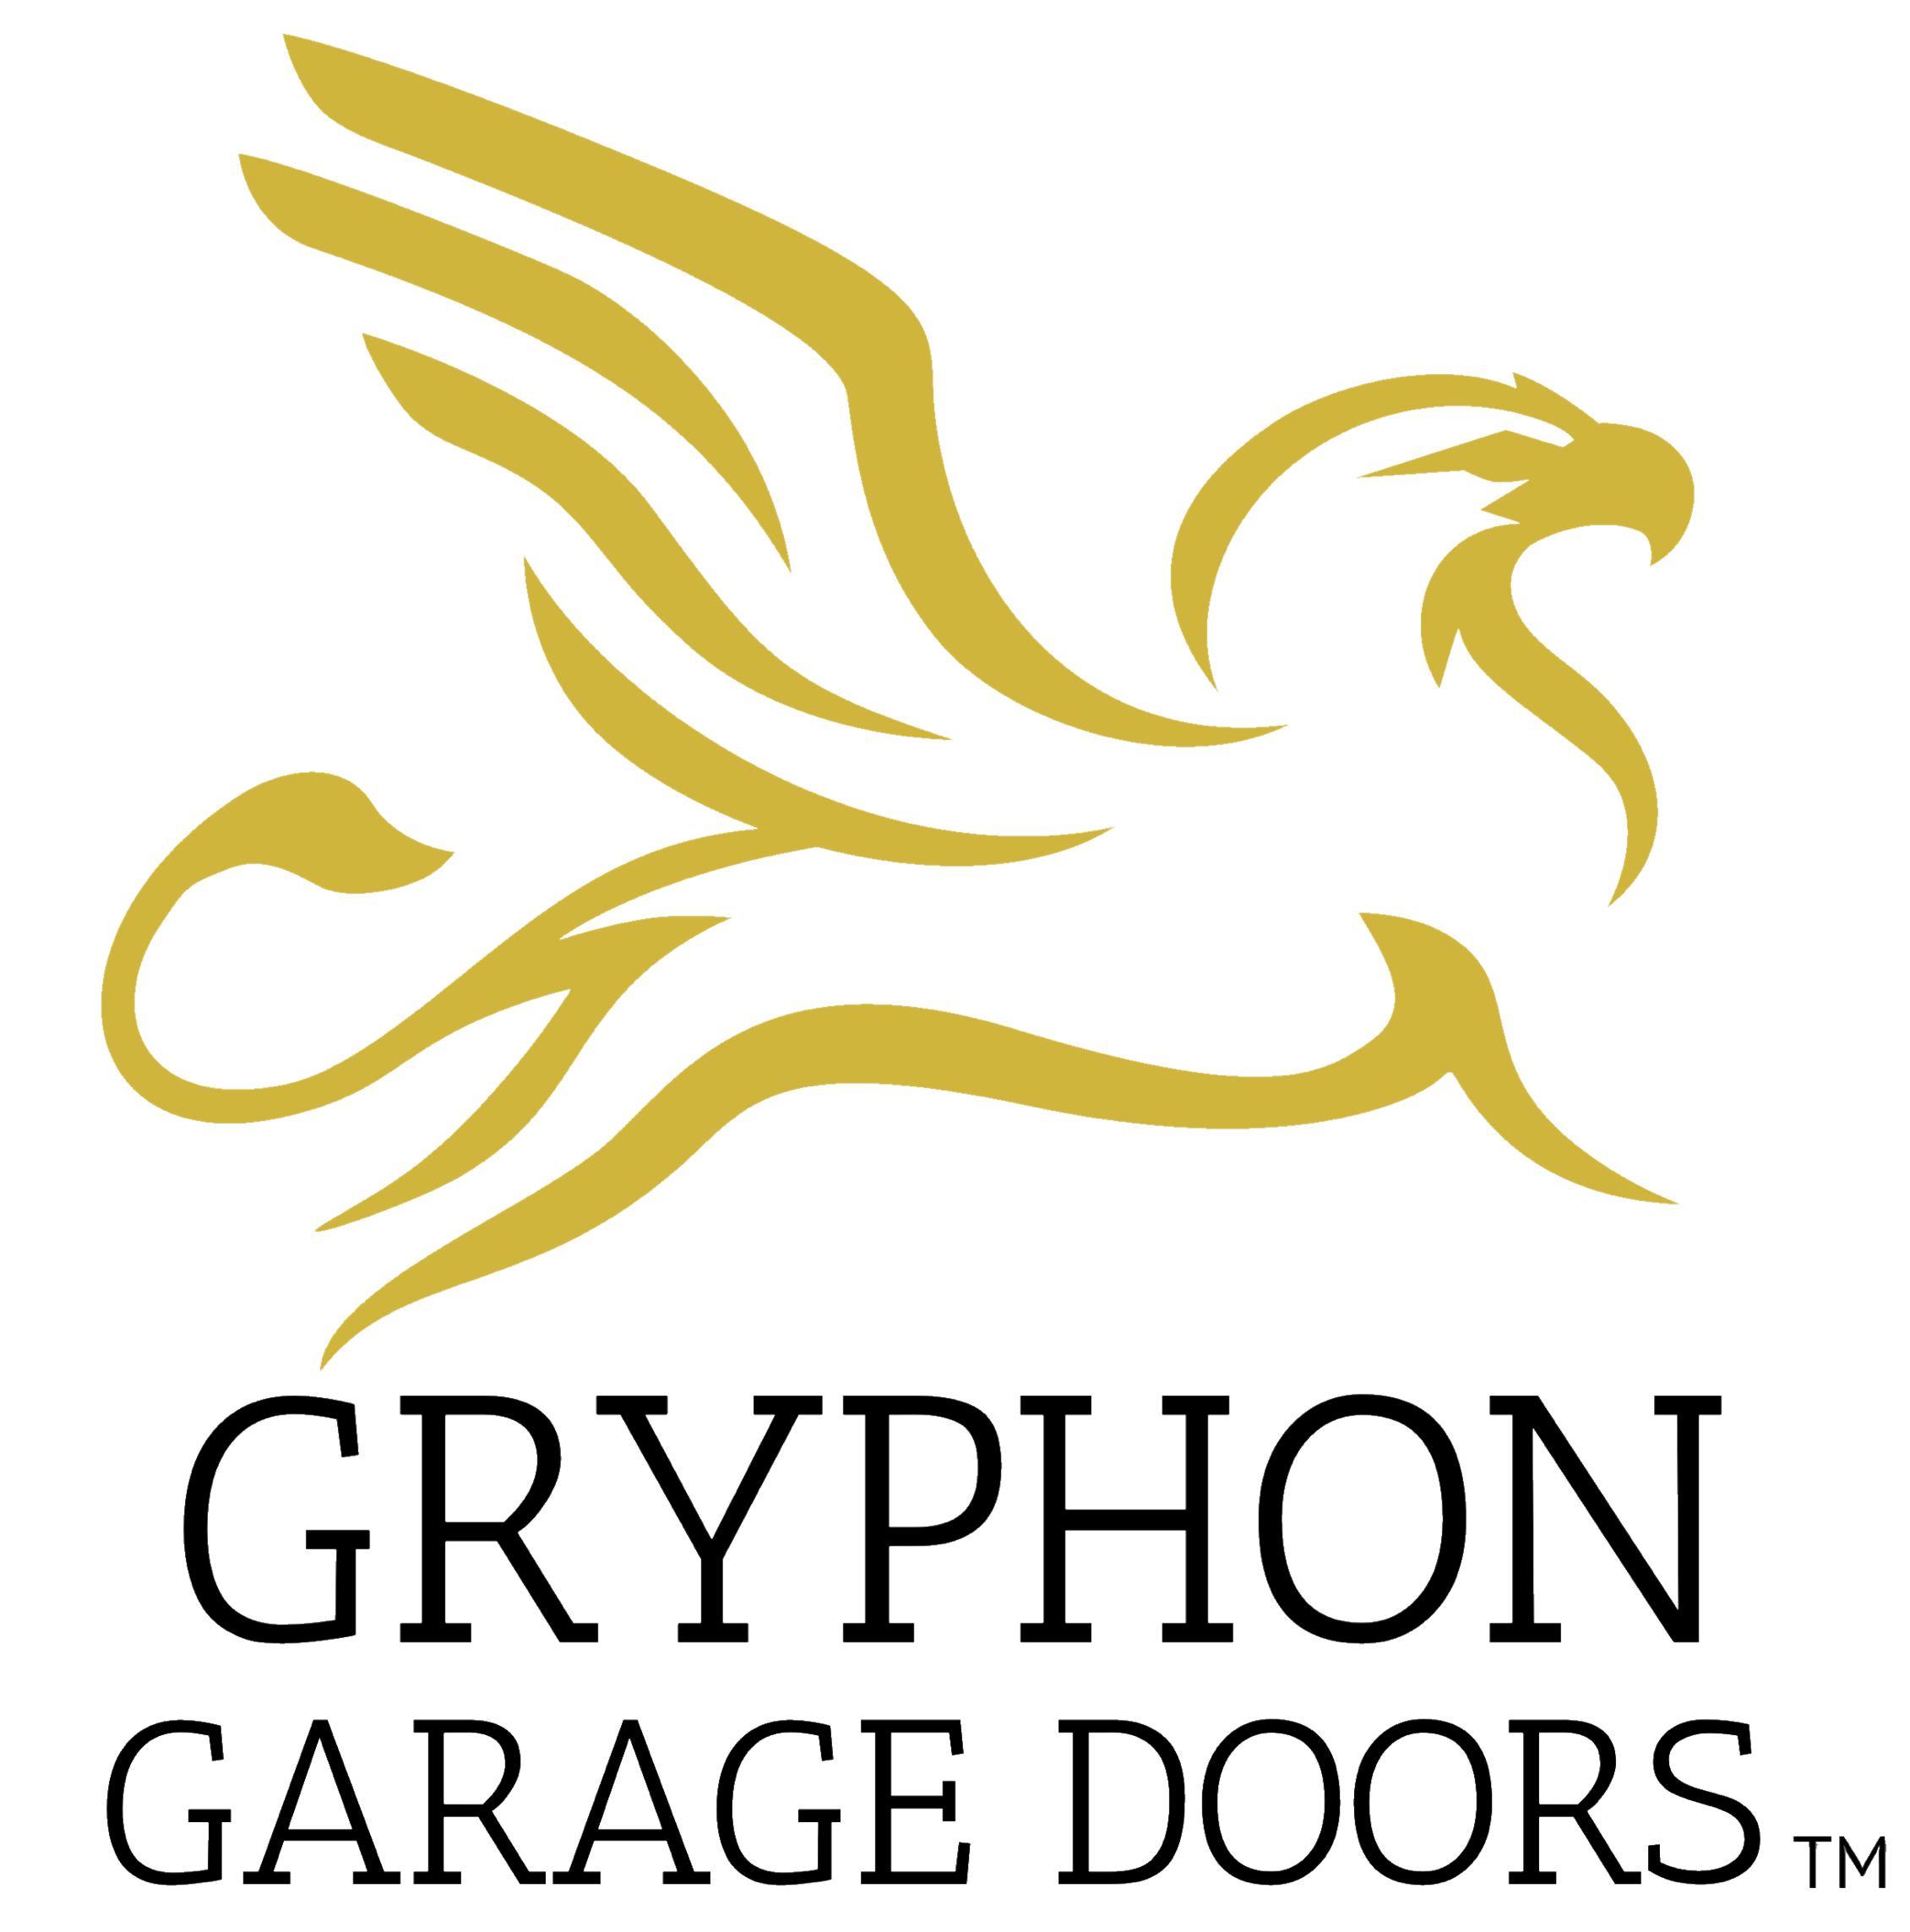 Gryphon Garage Doors — semantictrade e277c8fed20f